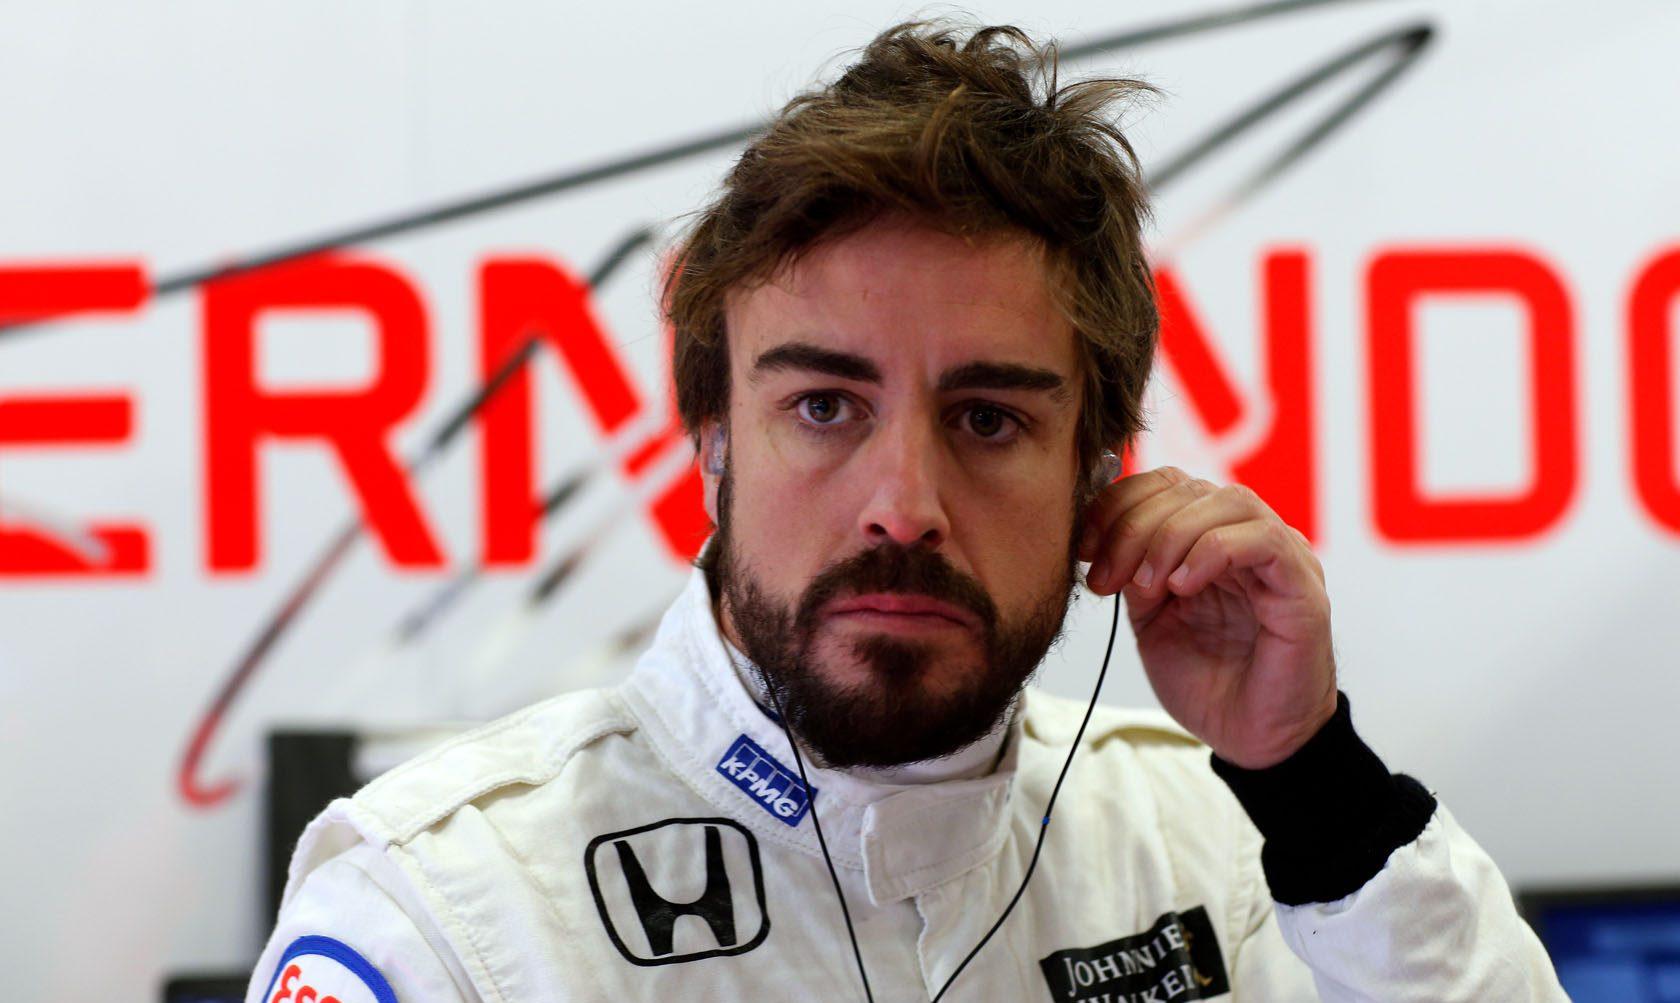 Fernando-Alonso-McLaren-Barcelona-2015-F1-testing-20